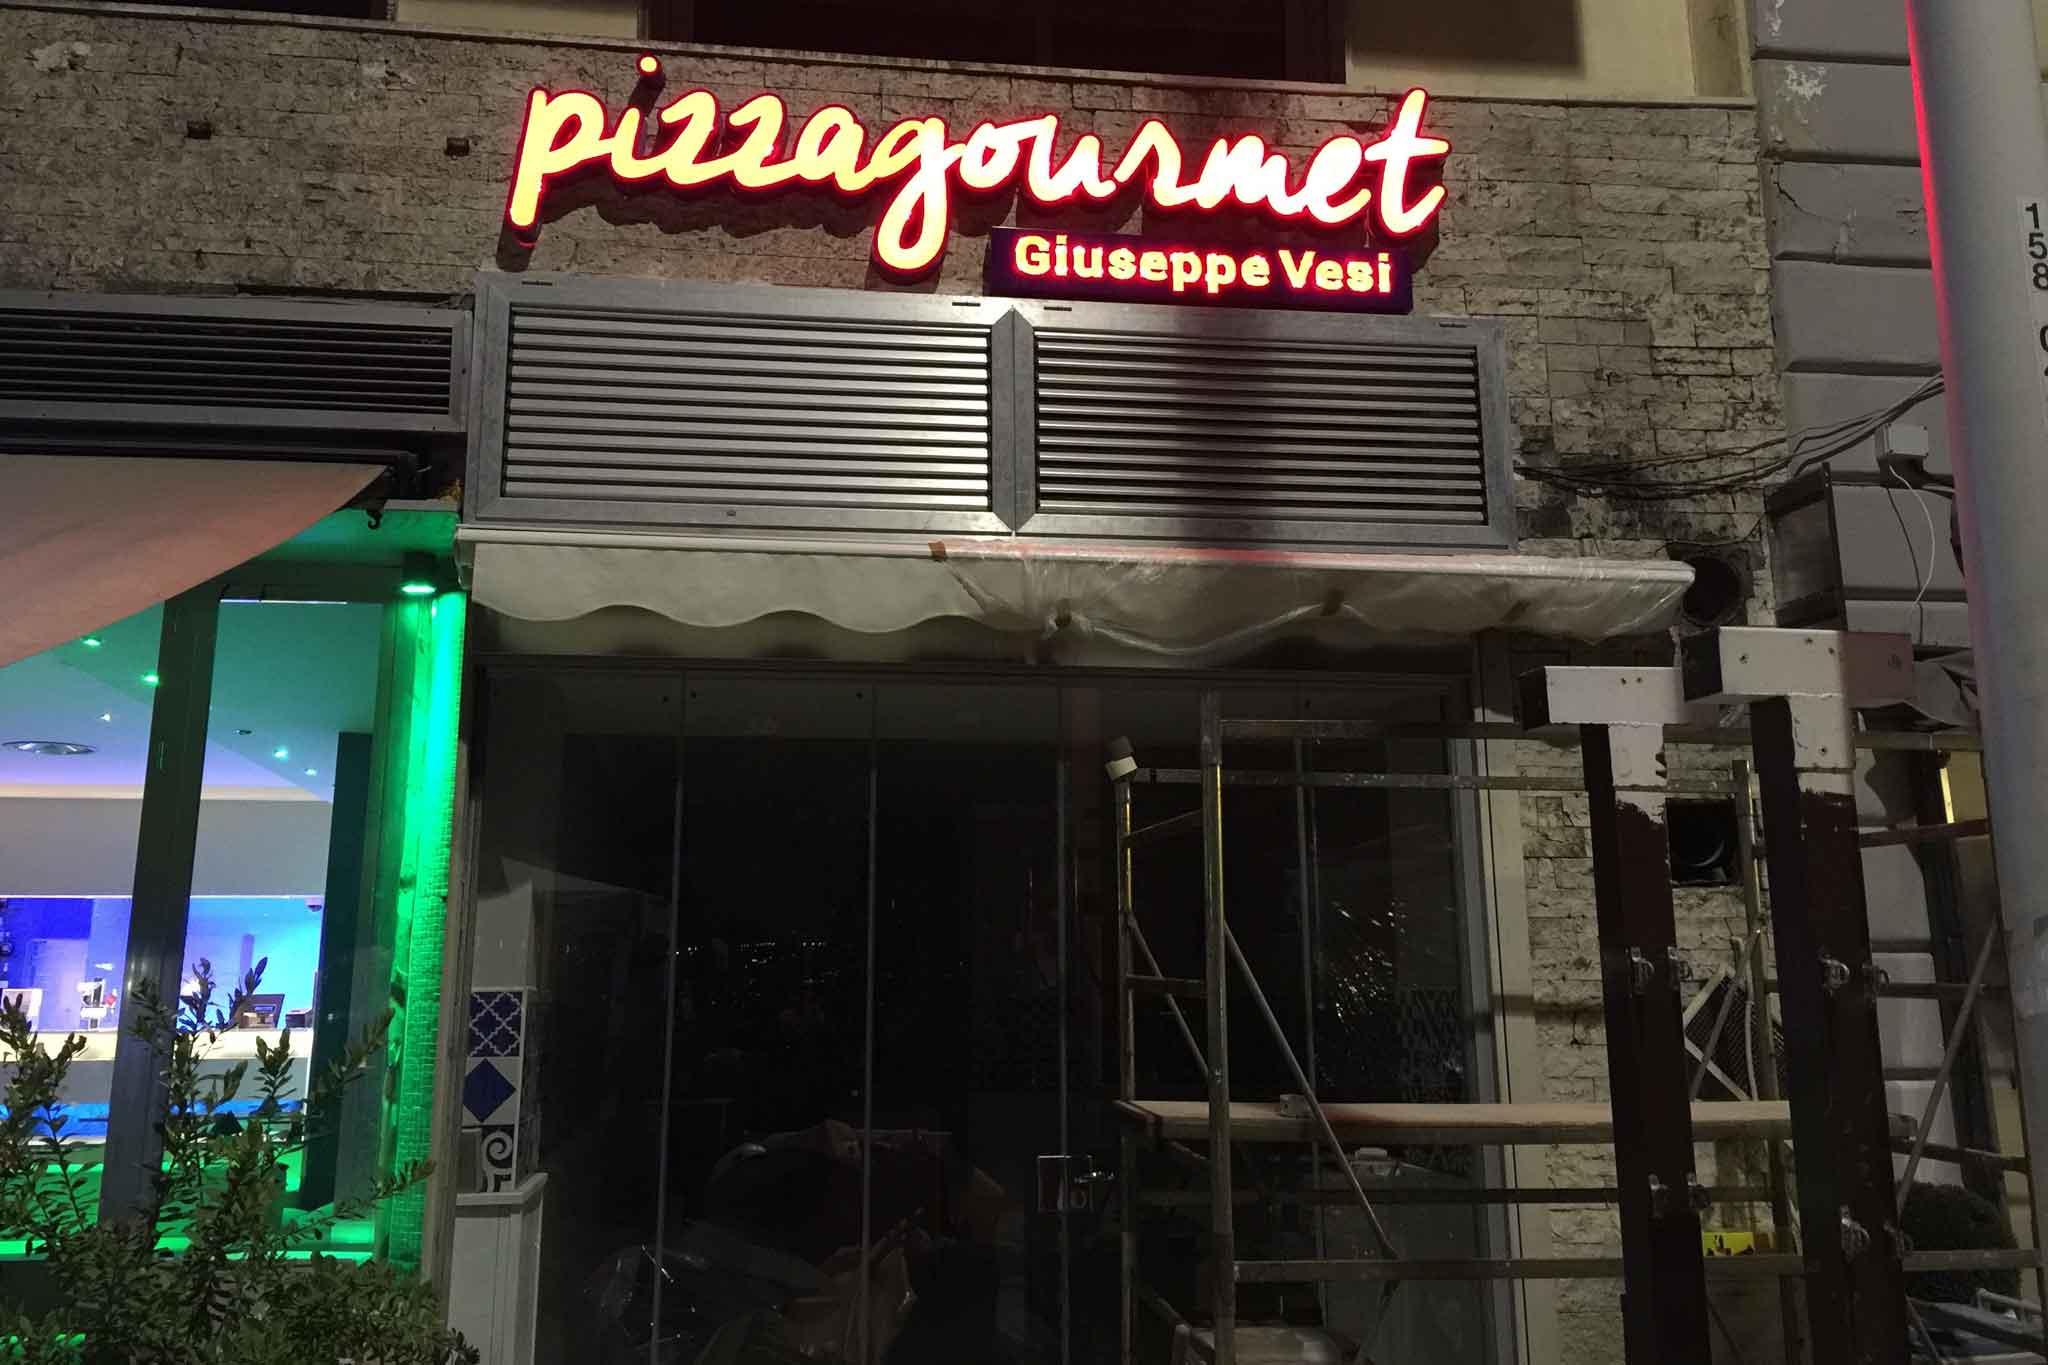 pizzagourmet Giuseppe Vesi Napoli